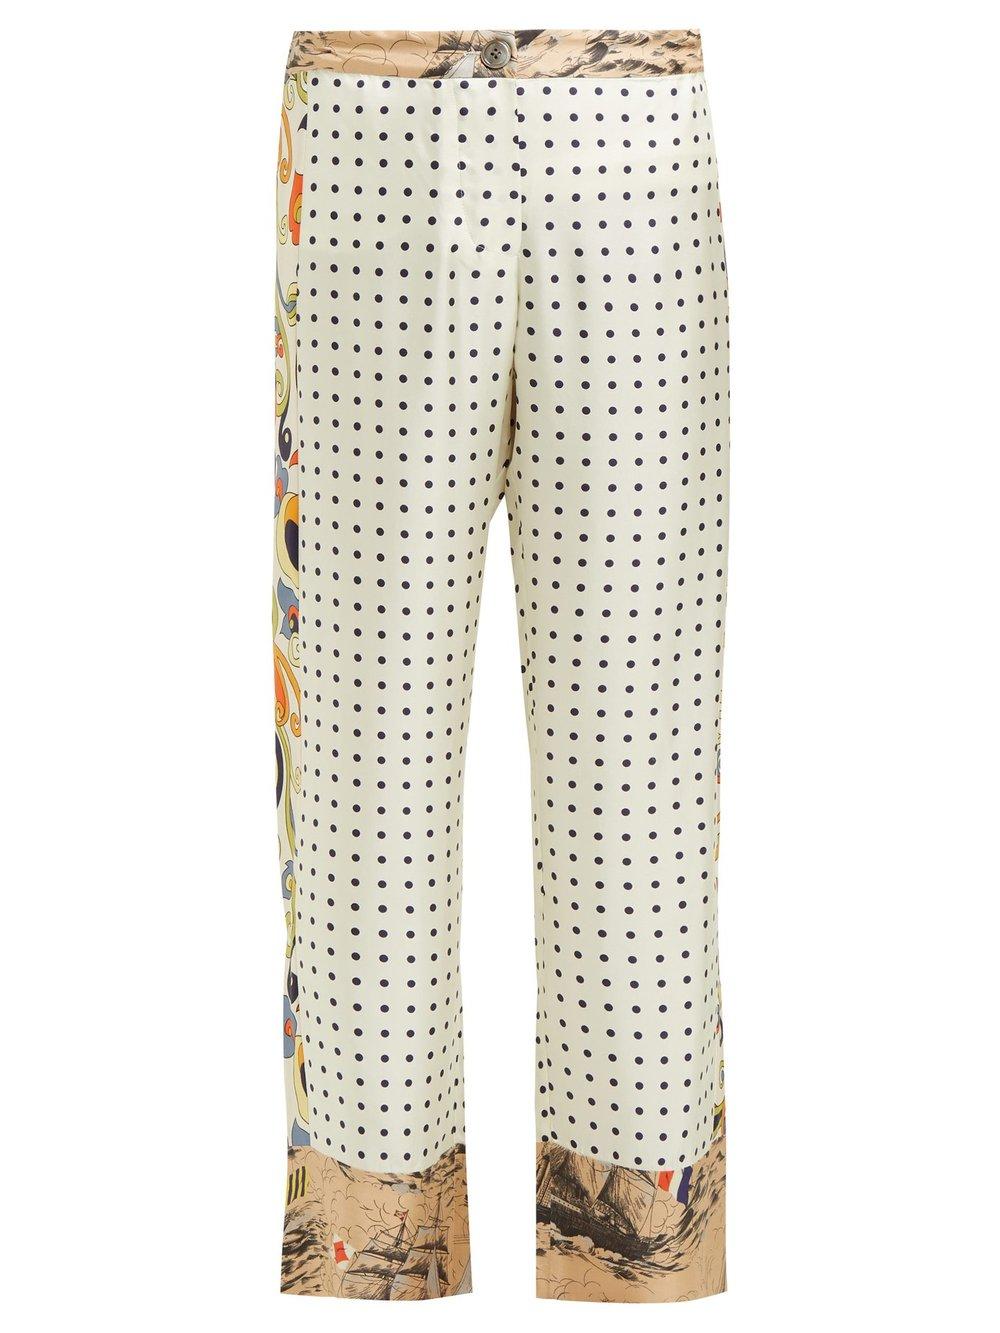 La Prestic Ouiston Riviera polka-dot silk trousers